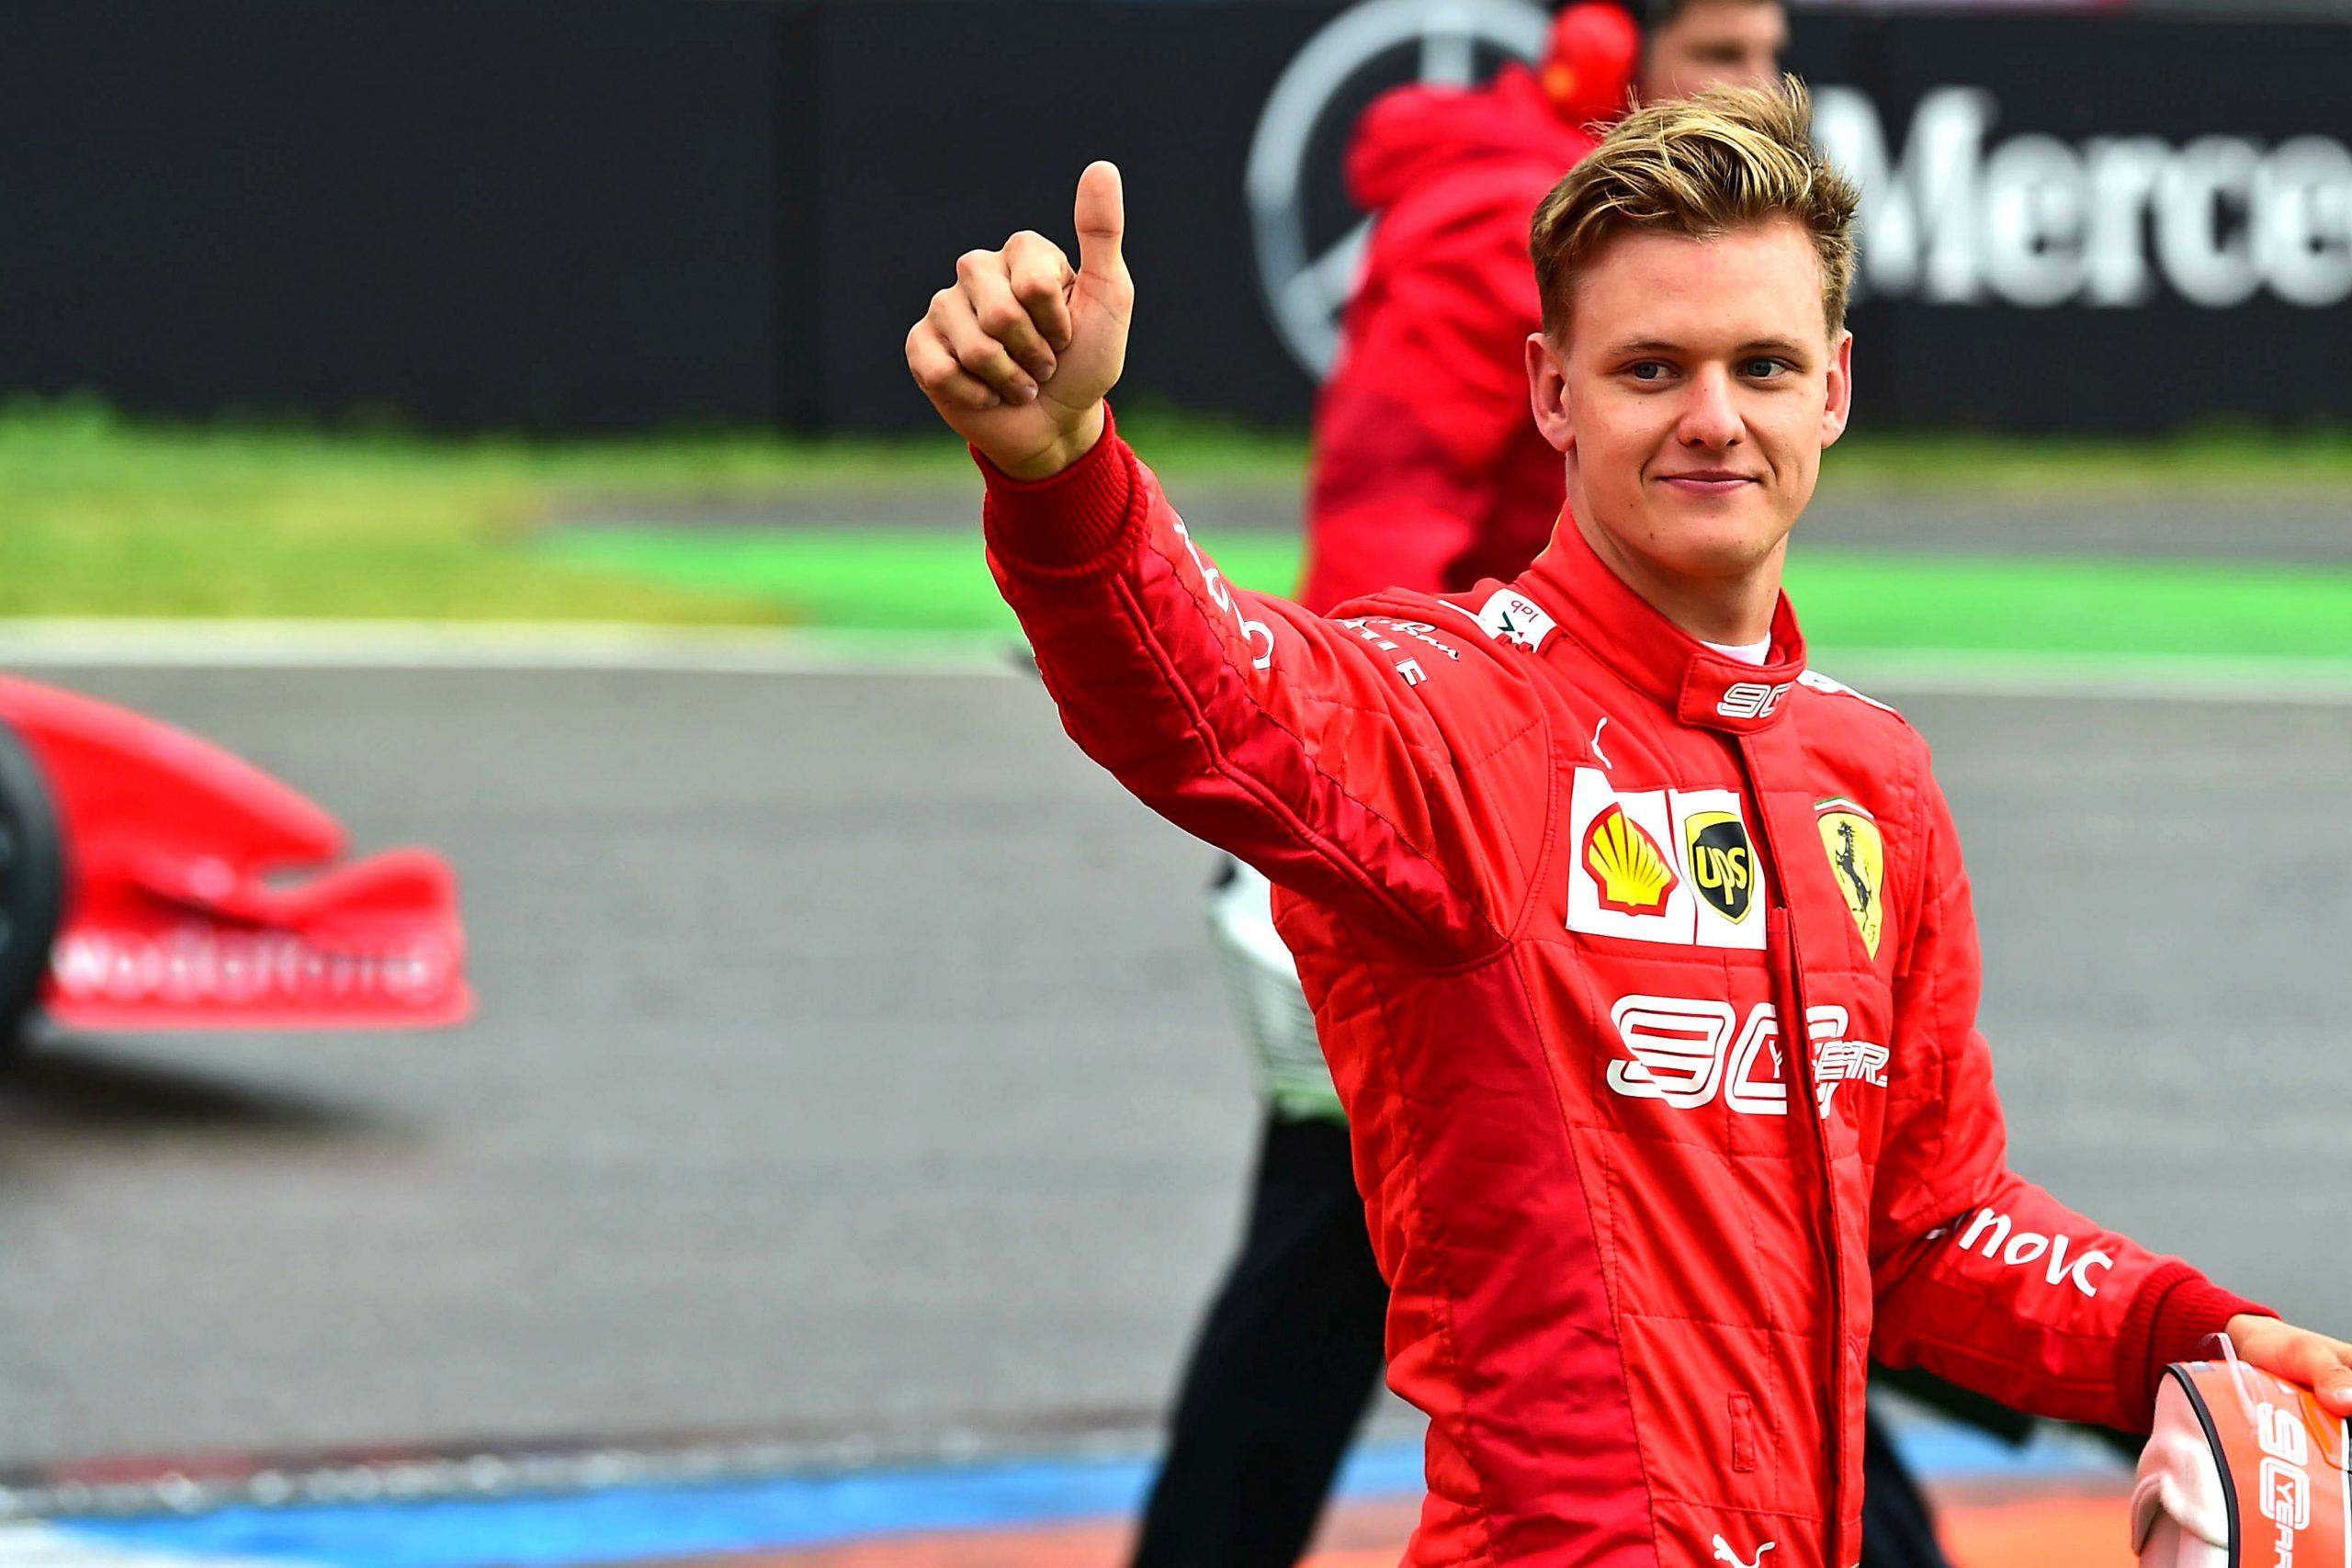 Мик Шумахер: Готов съм за Формула 1 1